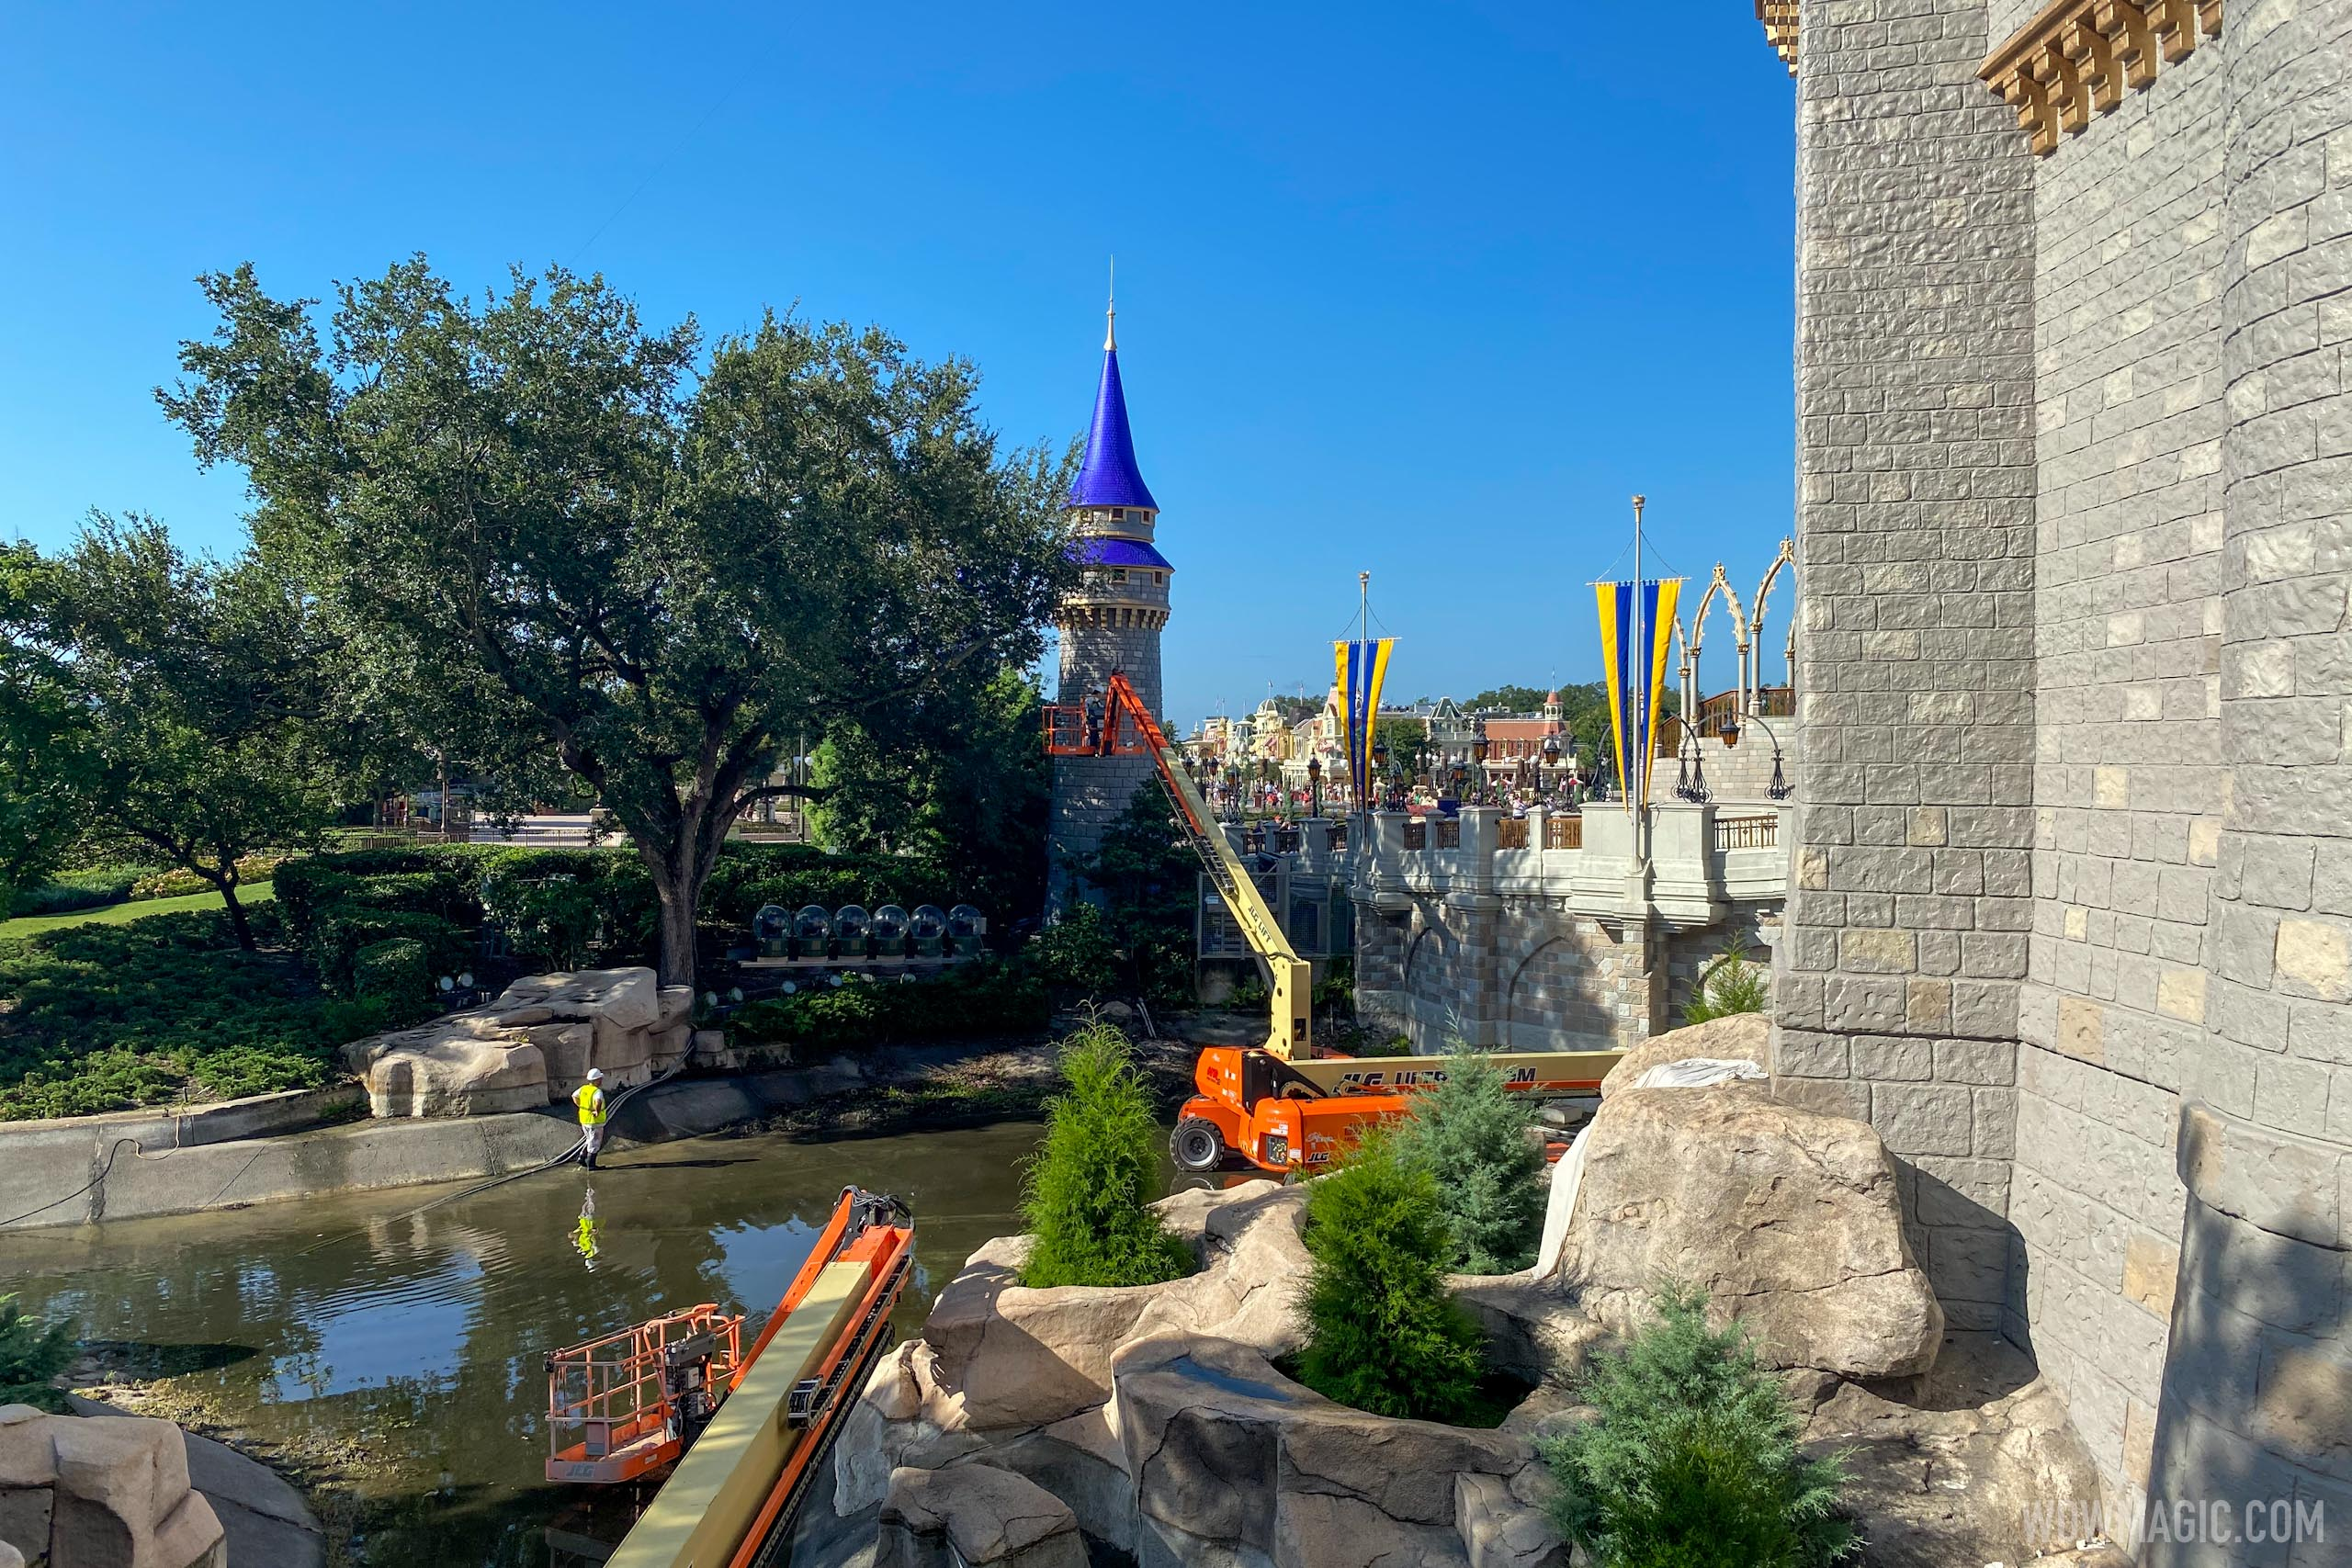 Cinderella Castle repainting - July 7 2020